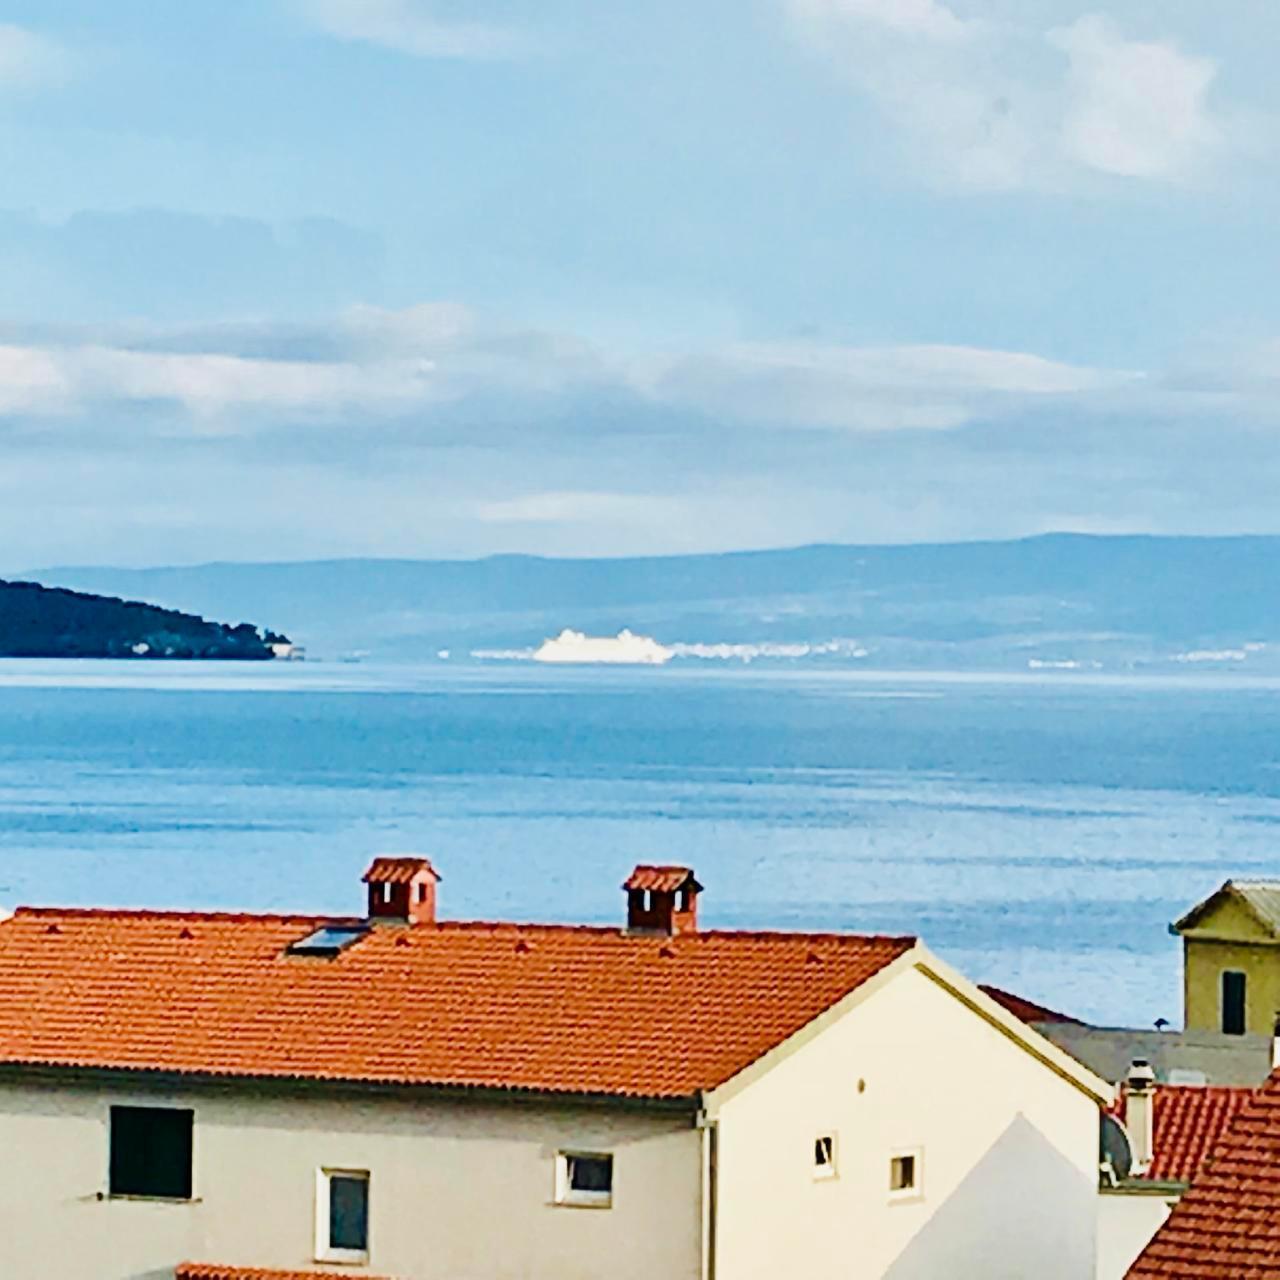 Ferienwohnung Apartmenthaus Ruza 7 - Studio (98388), Kaštel Štafilić, , Dalmatien, Kroatien, Bild 12